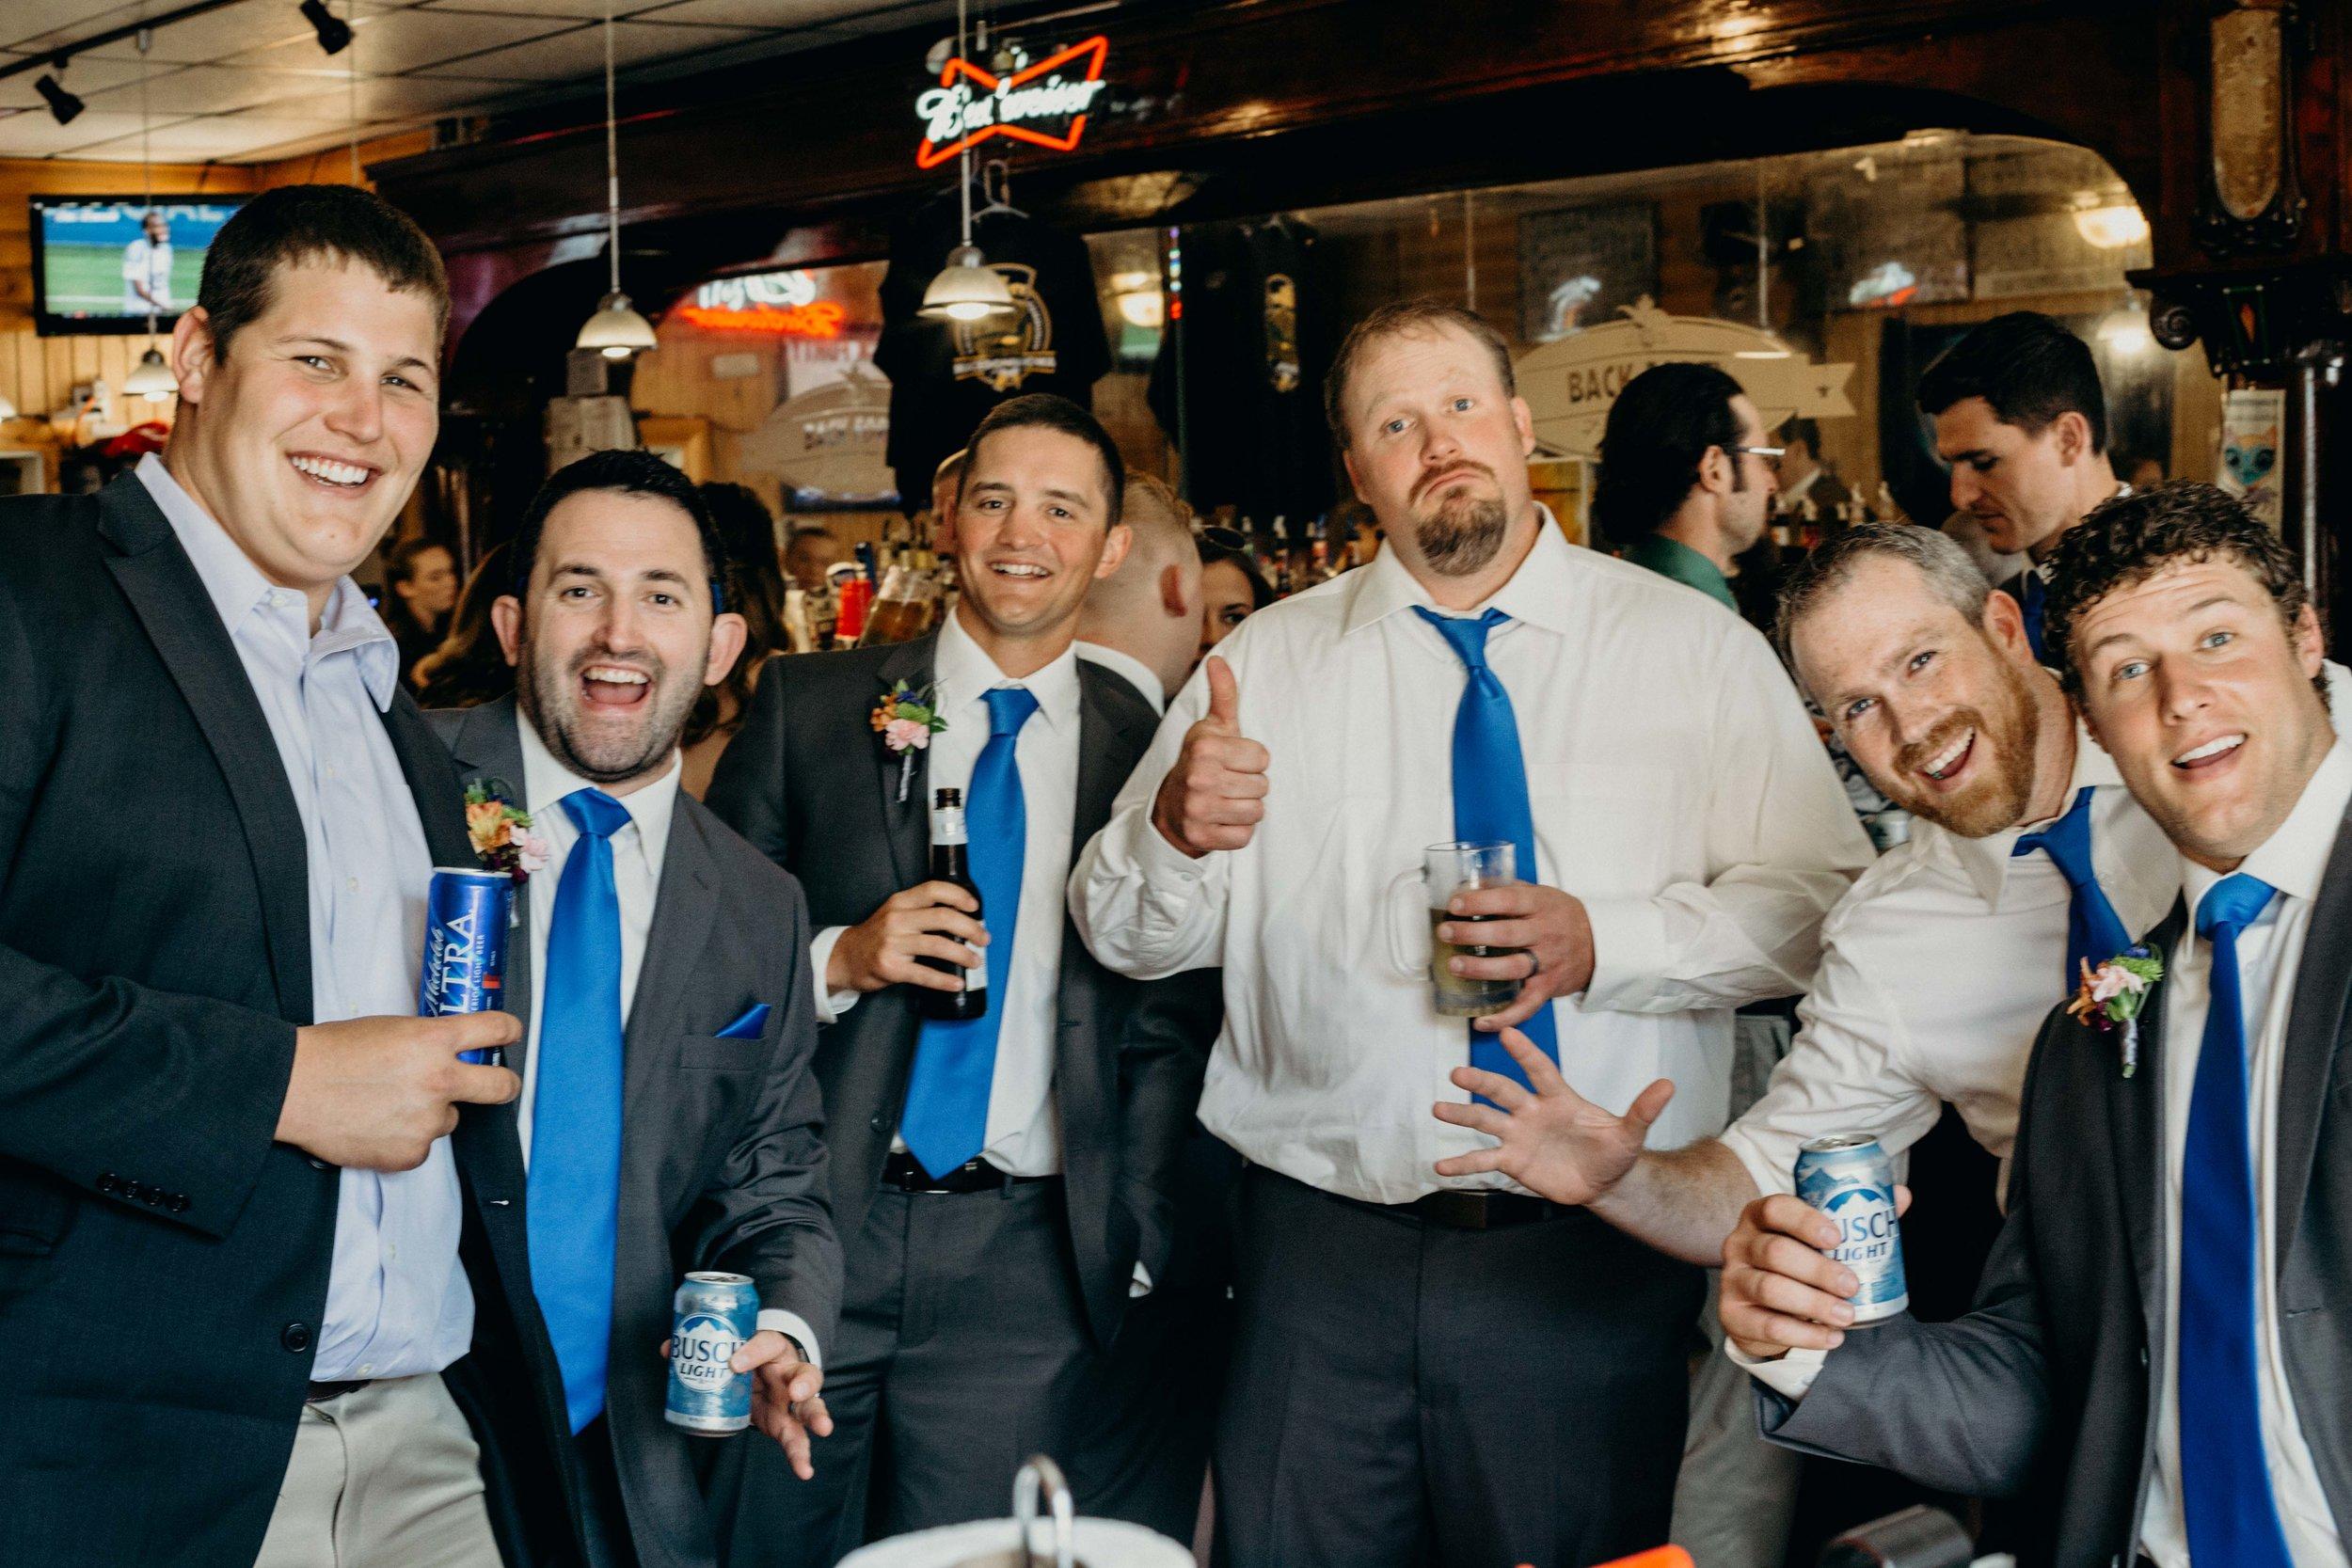 Iowa wedding_Dawn McClannan Photo-105.jpg